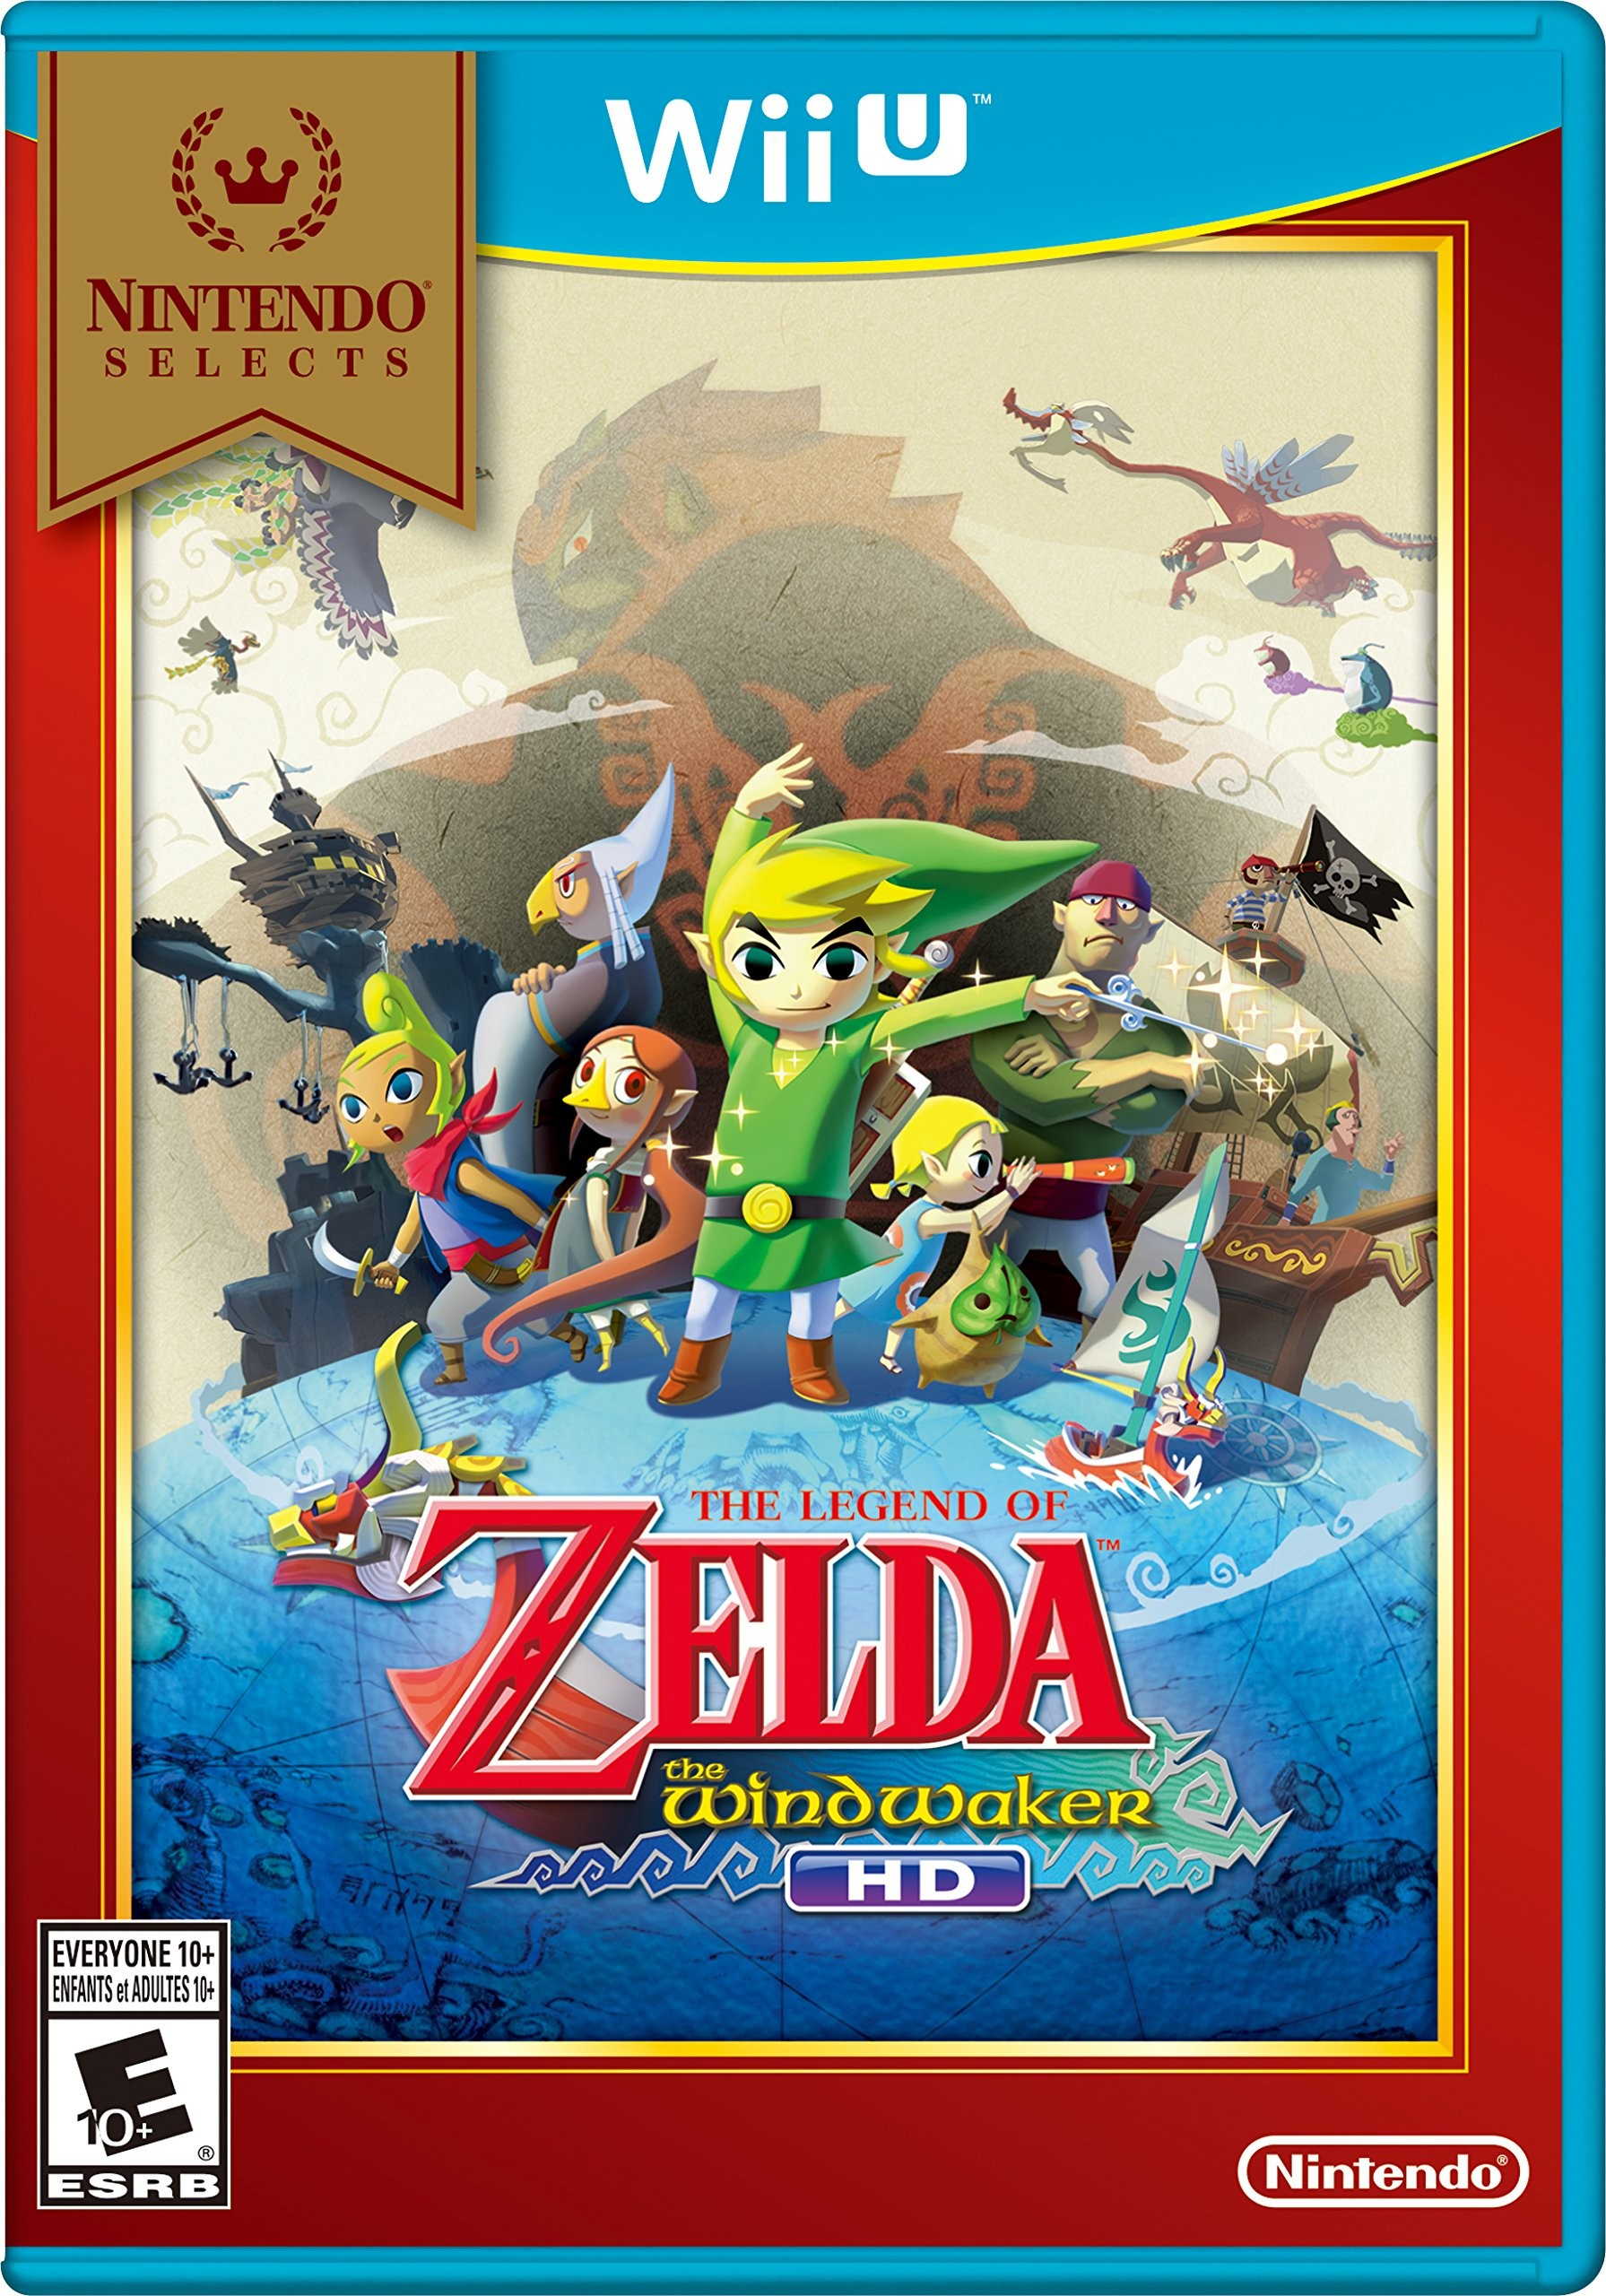 Nintendo Selects: The Legend of Zelda: The Wind Waker HD – Wii U